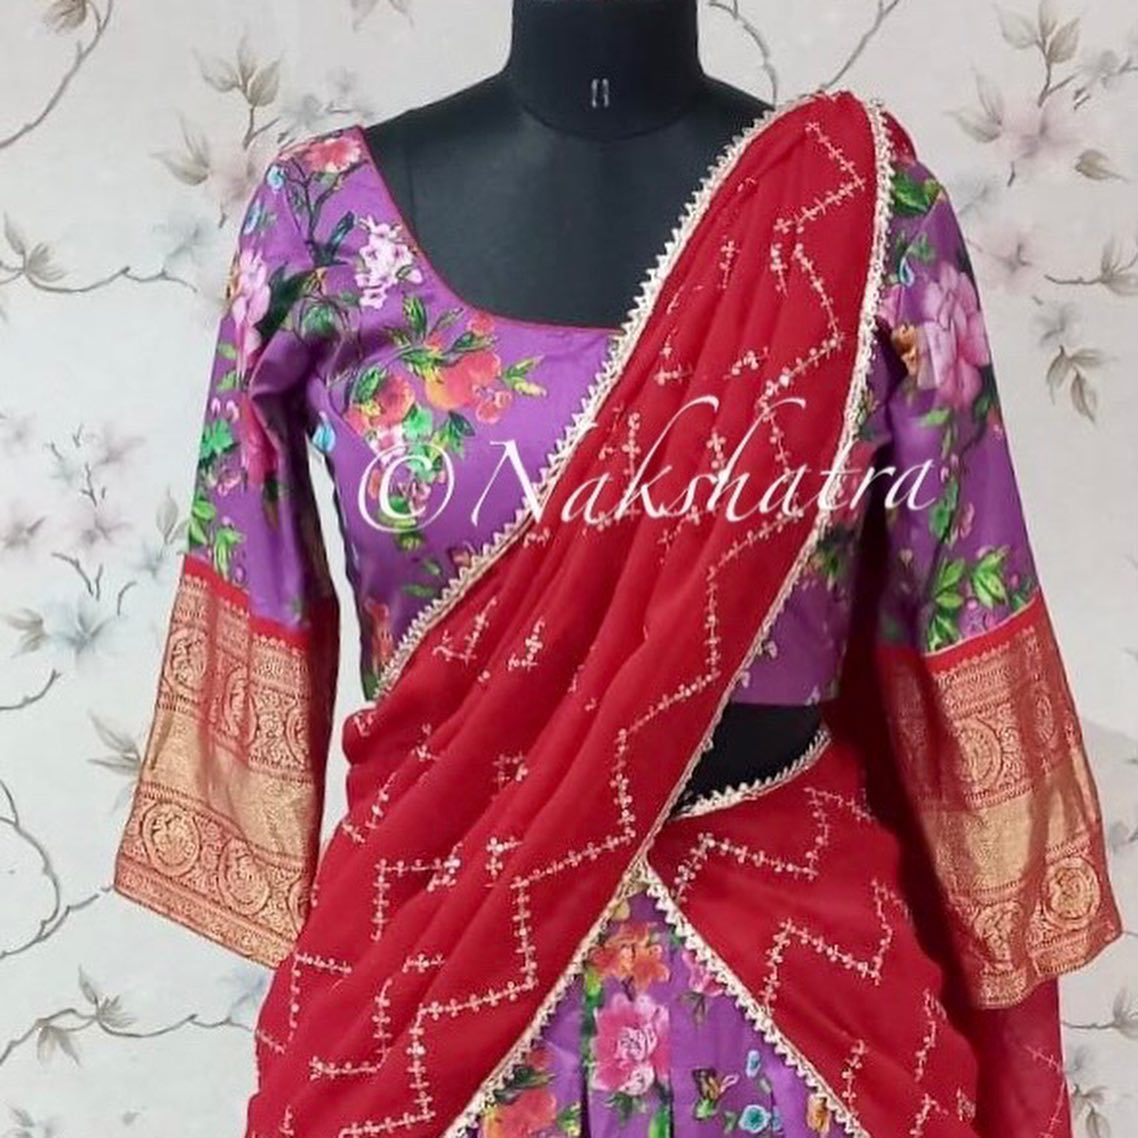 Flaunt this upcoming SravanaMaasam with  Stunning lavender kanchi floral lehangas